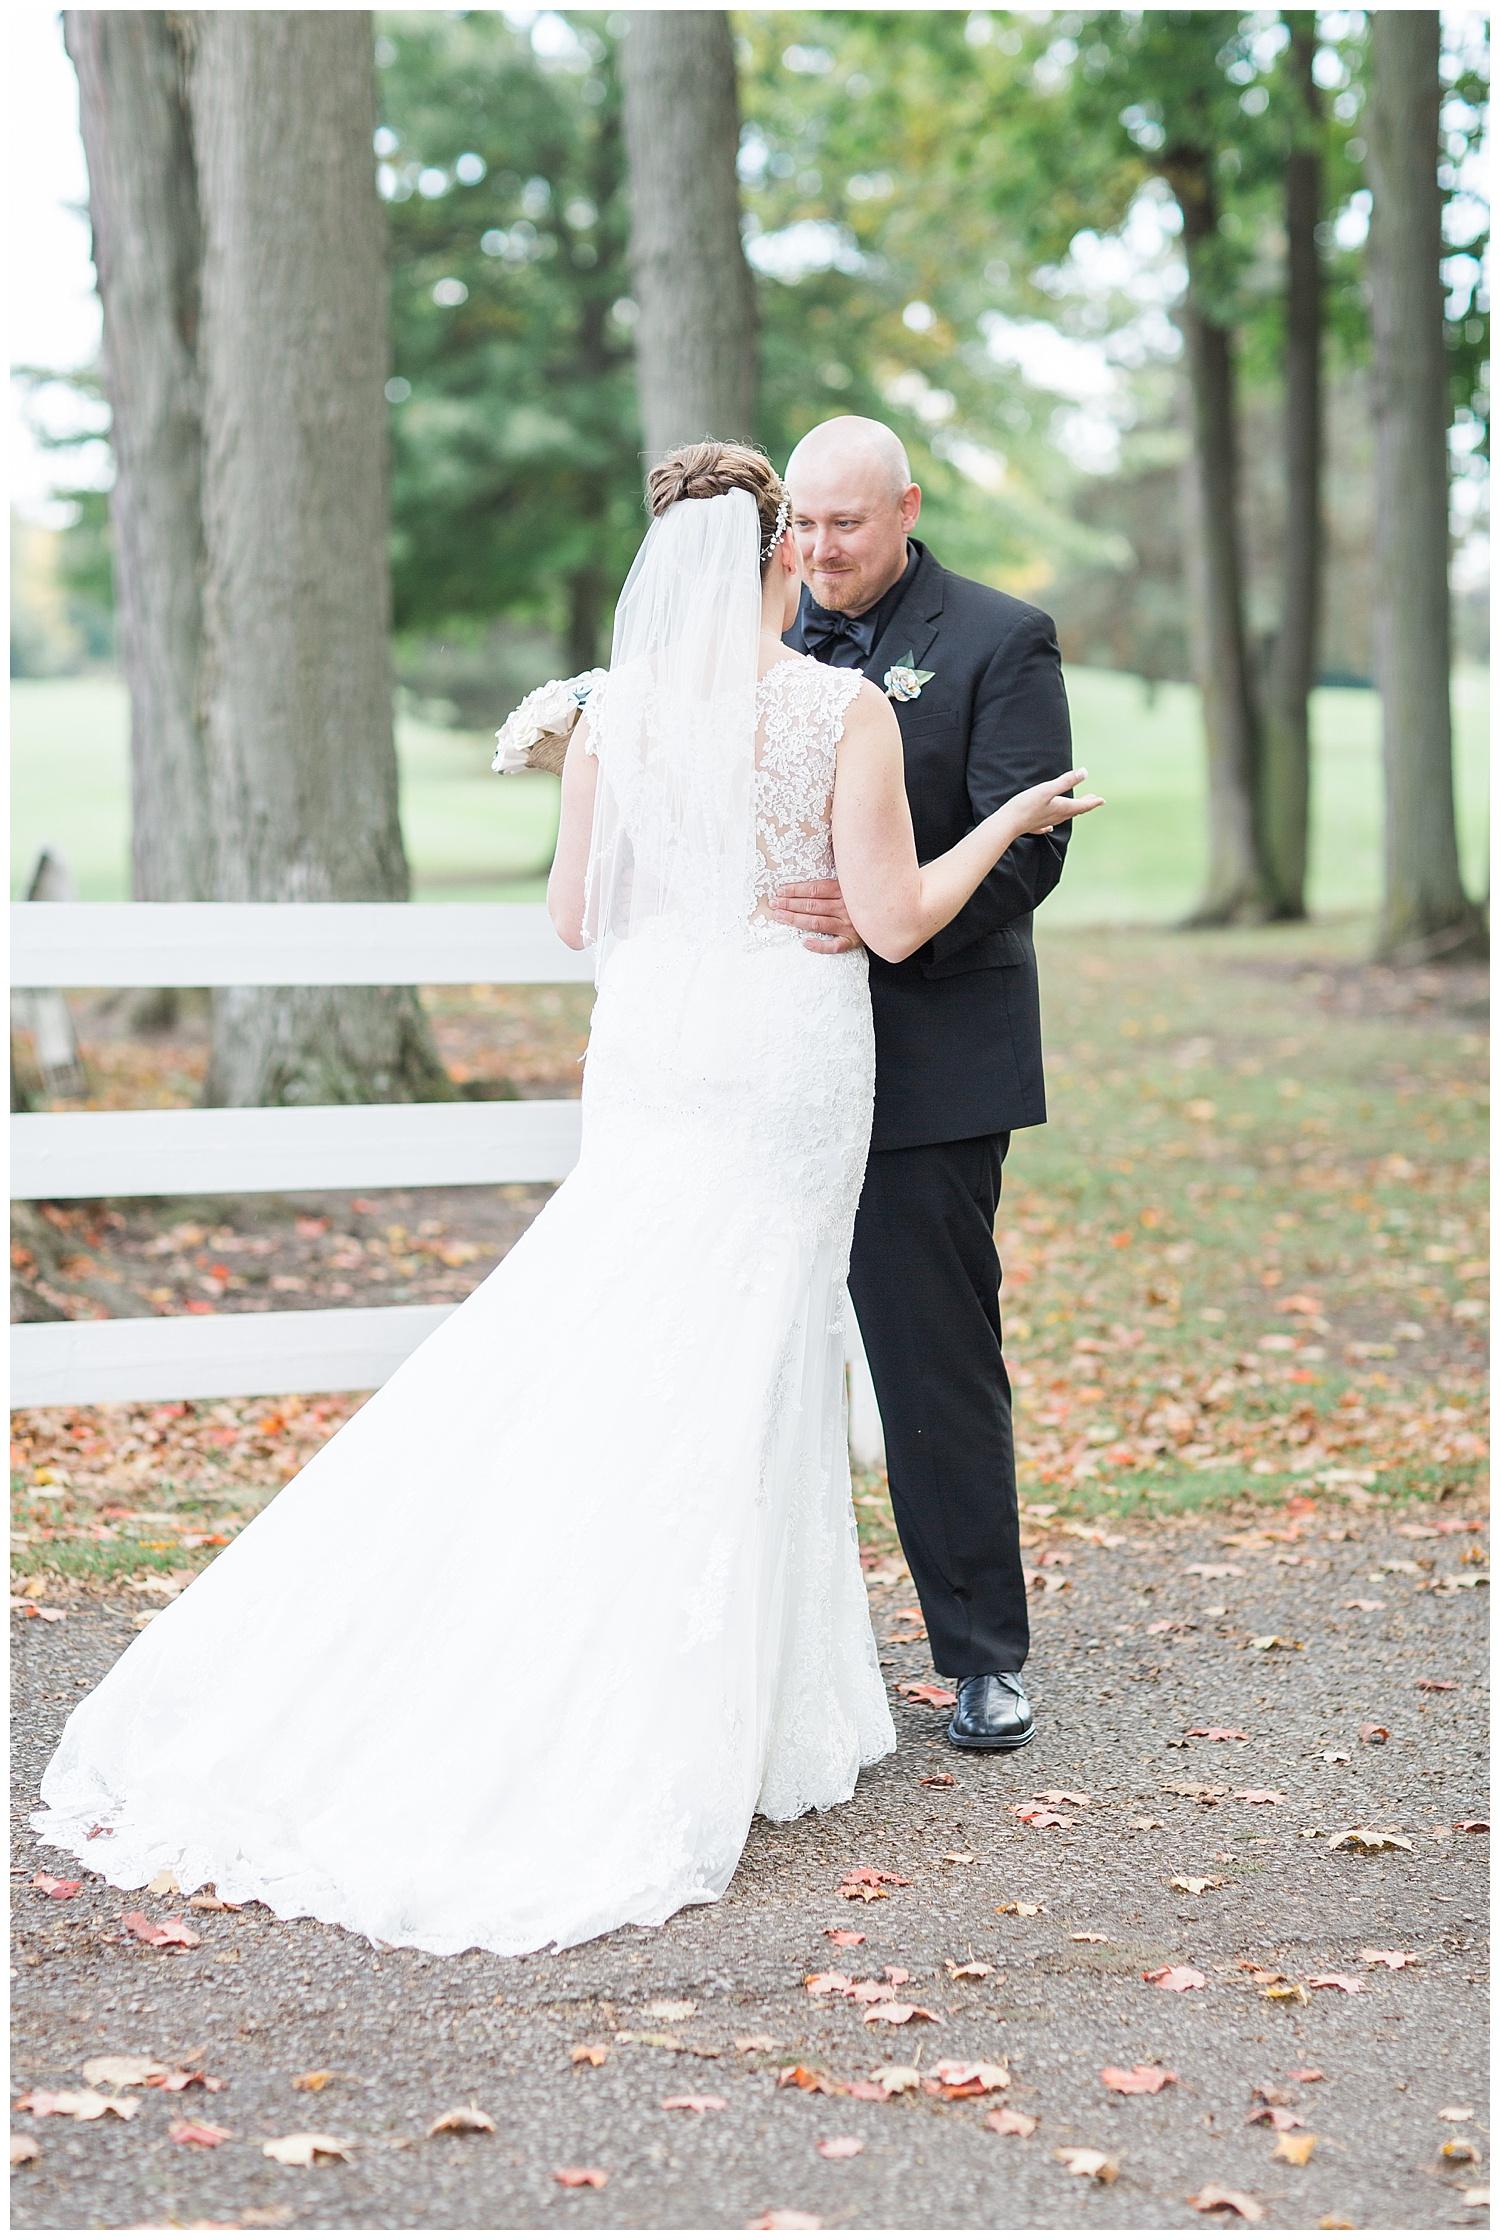 Jessica and Scott McKay - Terry Hills Golf Course - Batavia NY - Lass and Beau-56_Buffalo wedding photography.jpg